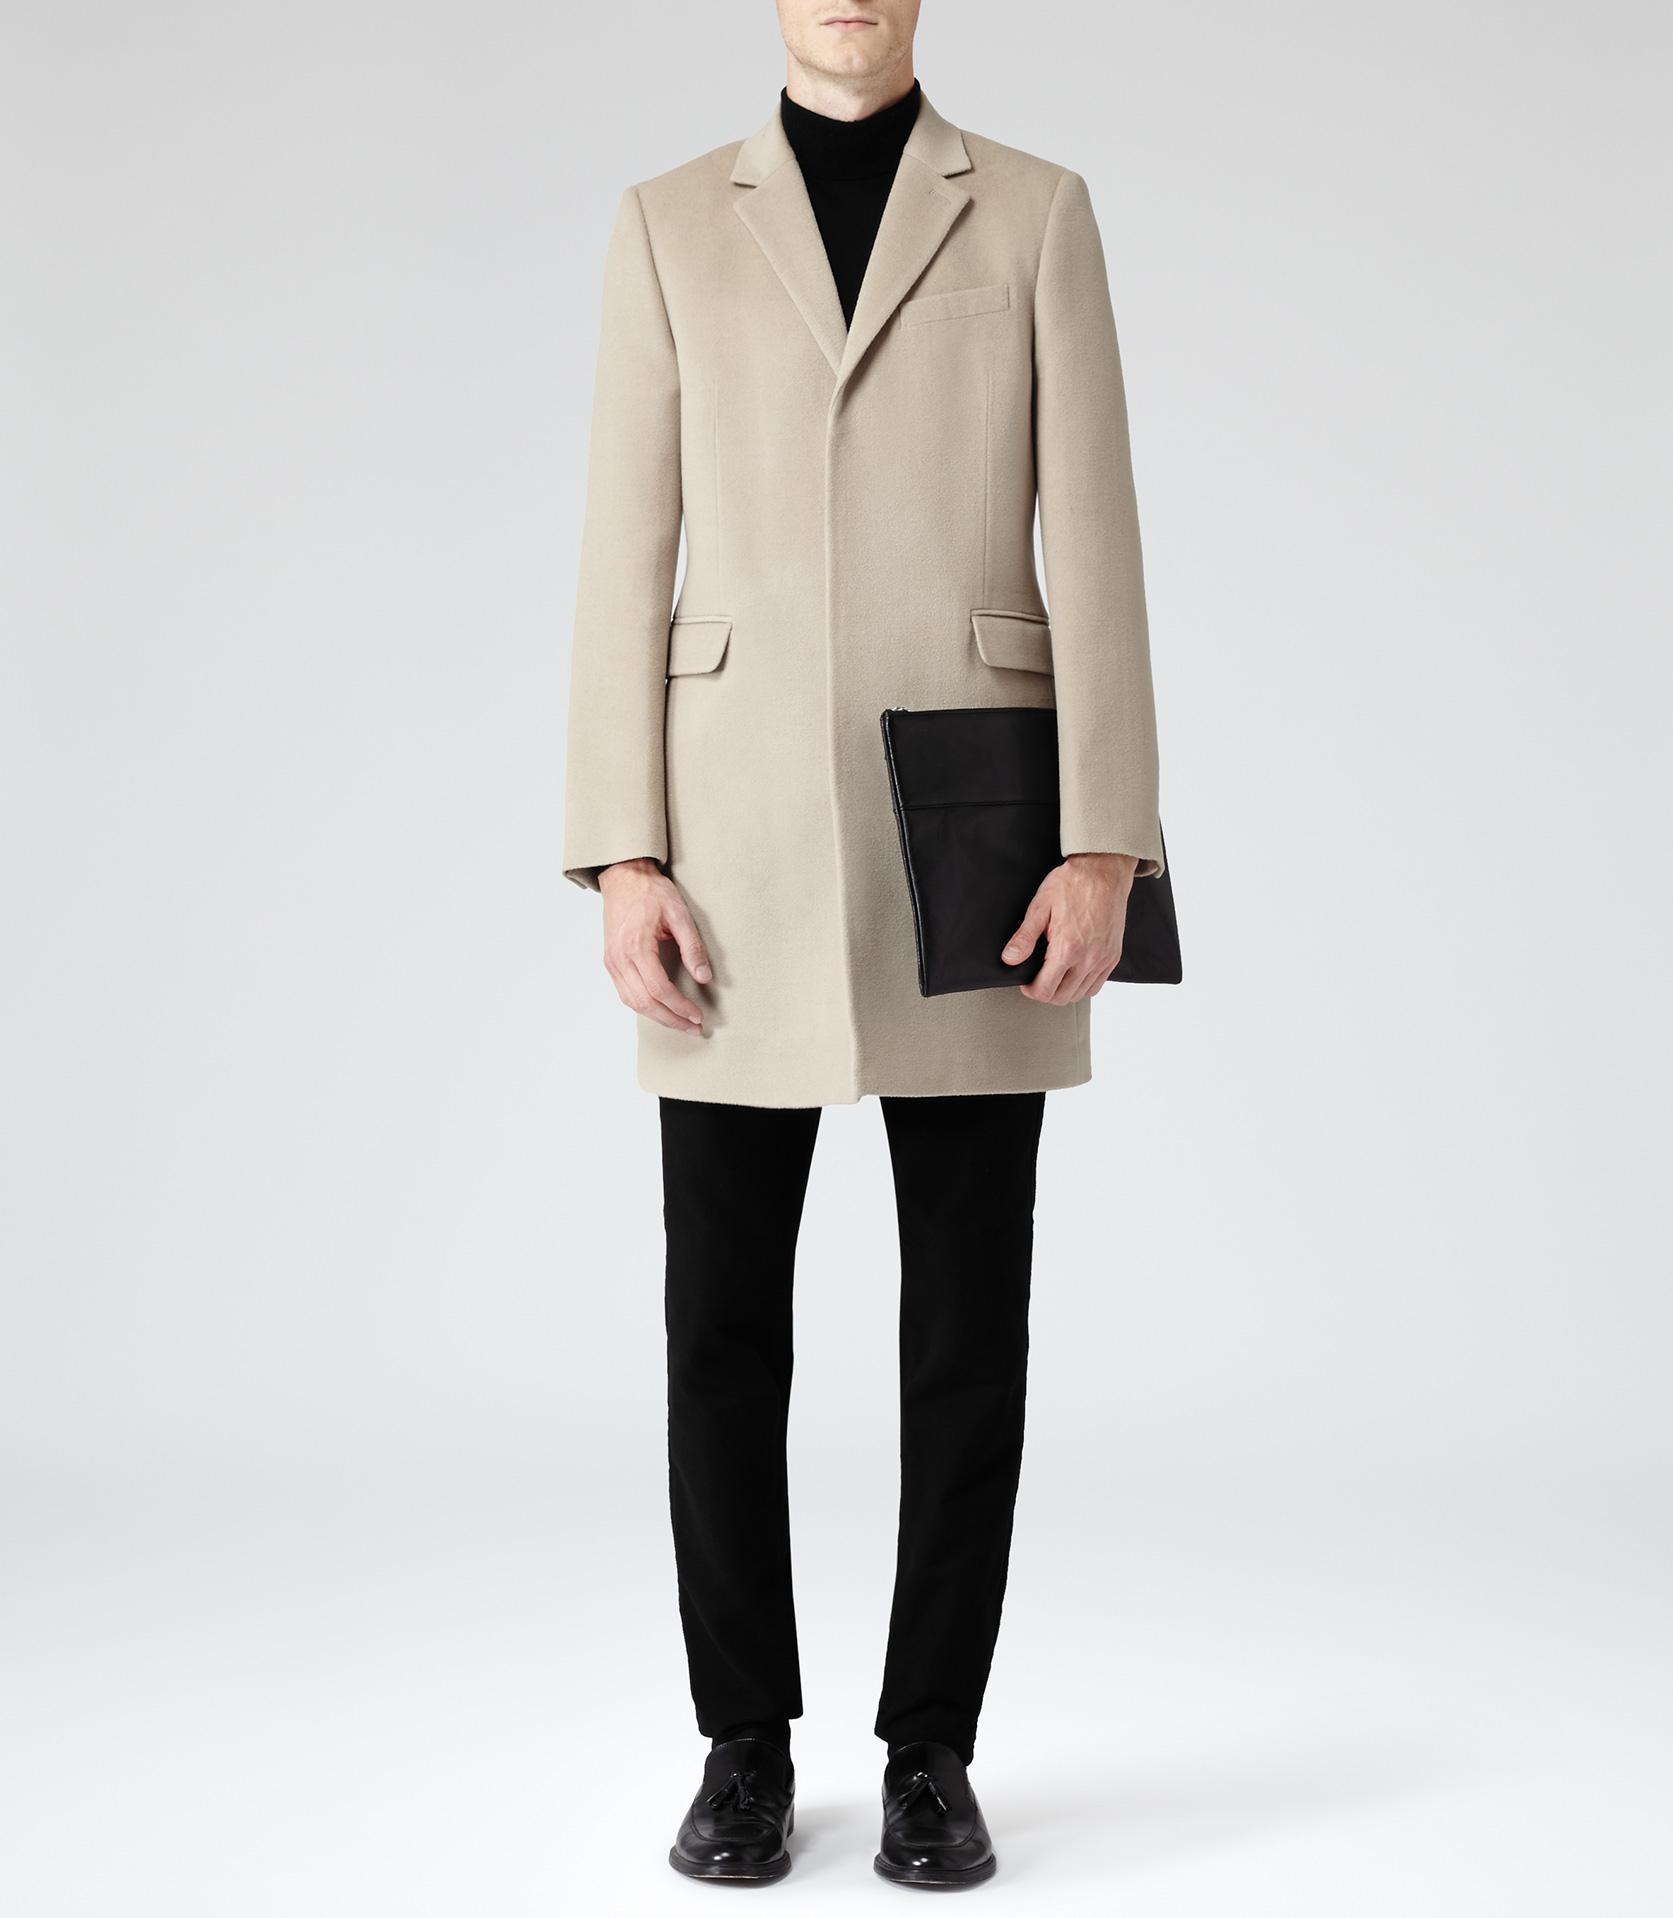 Reiss Vassal Single Breasted Wool Coat In Camel Natural